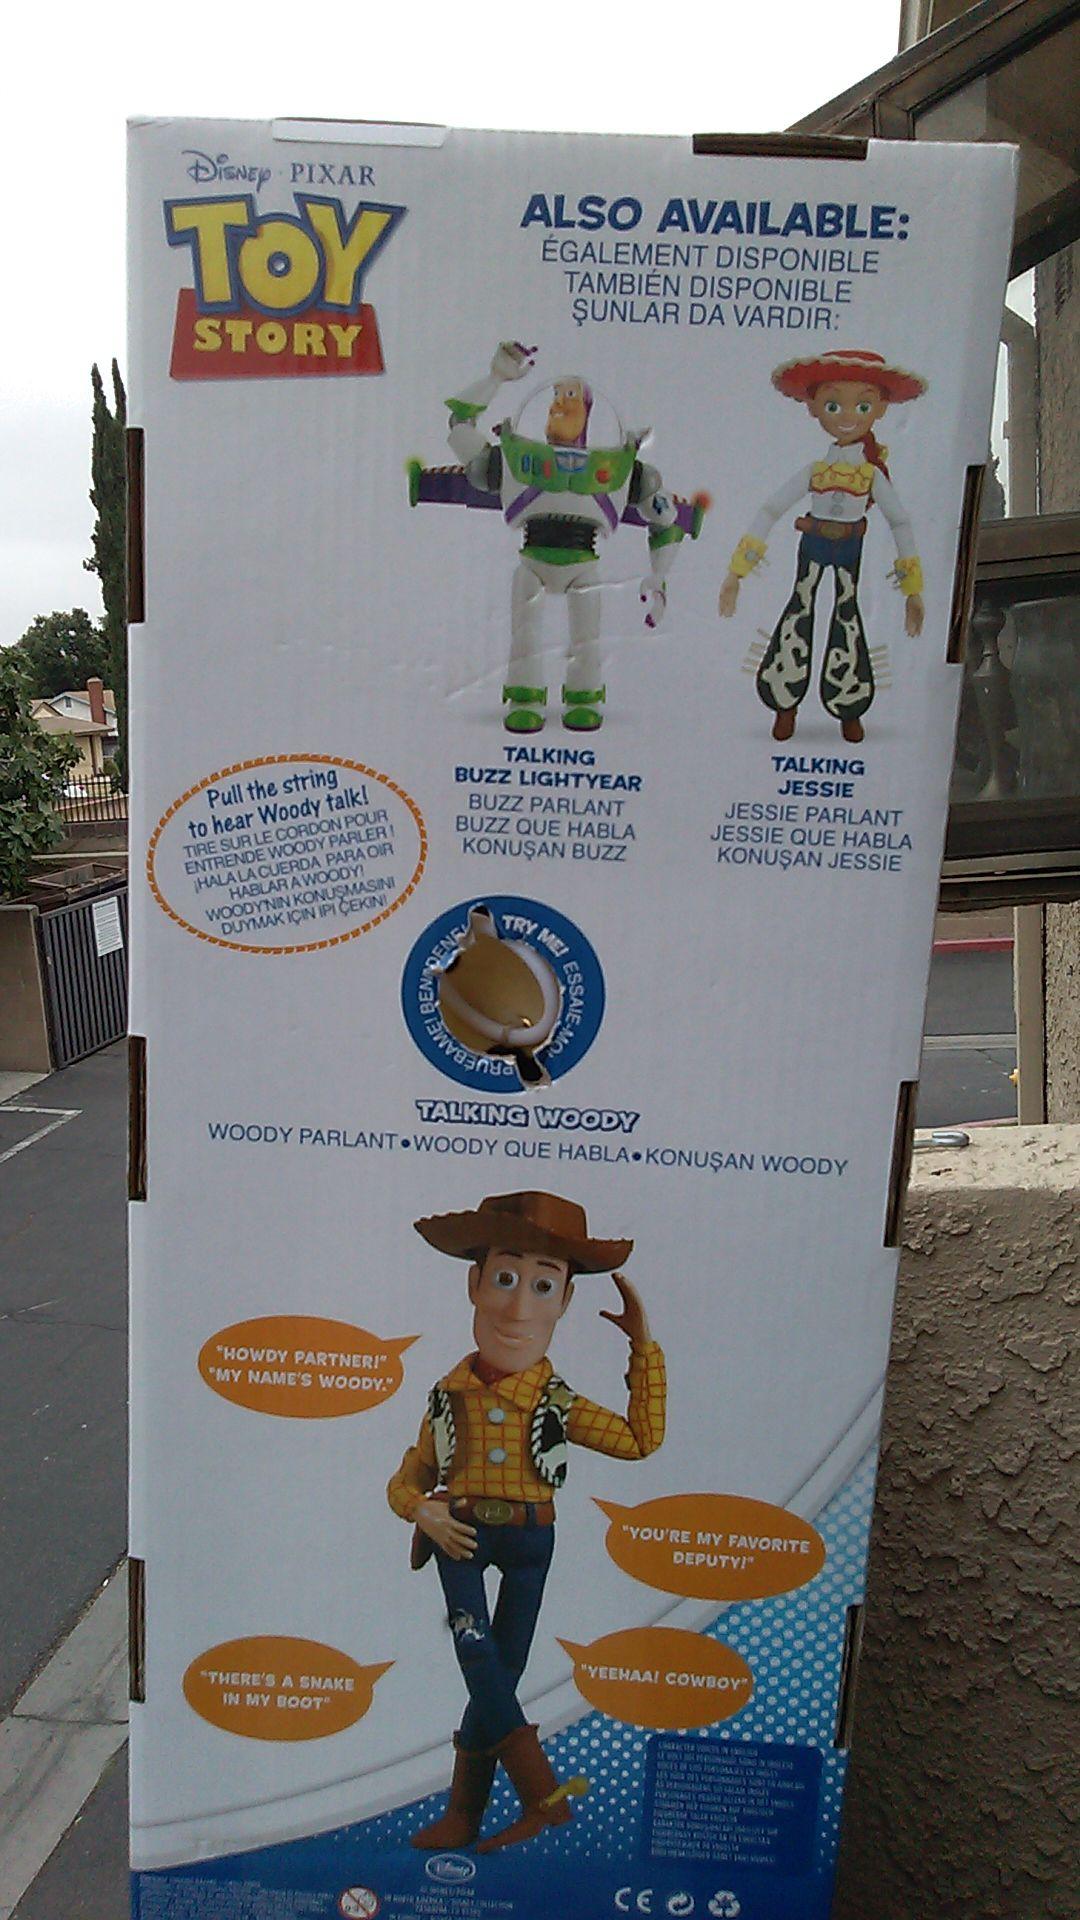 Talking Woody